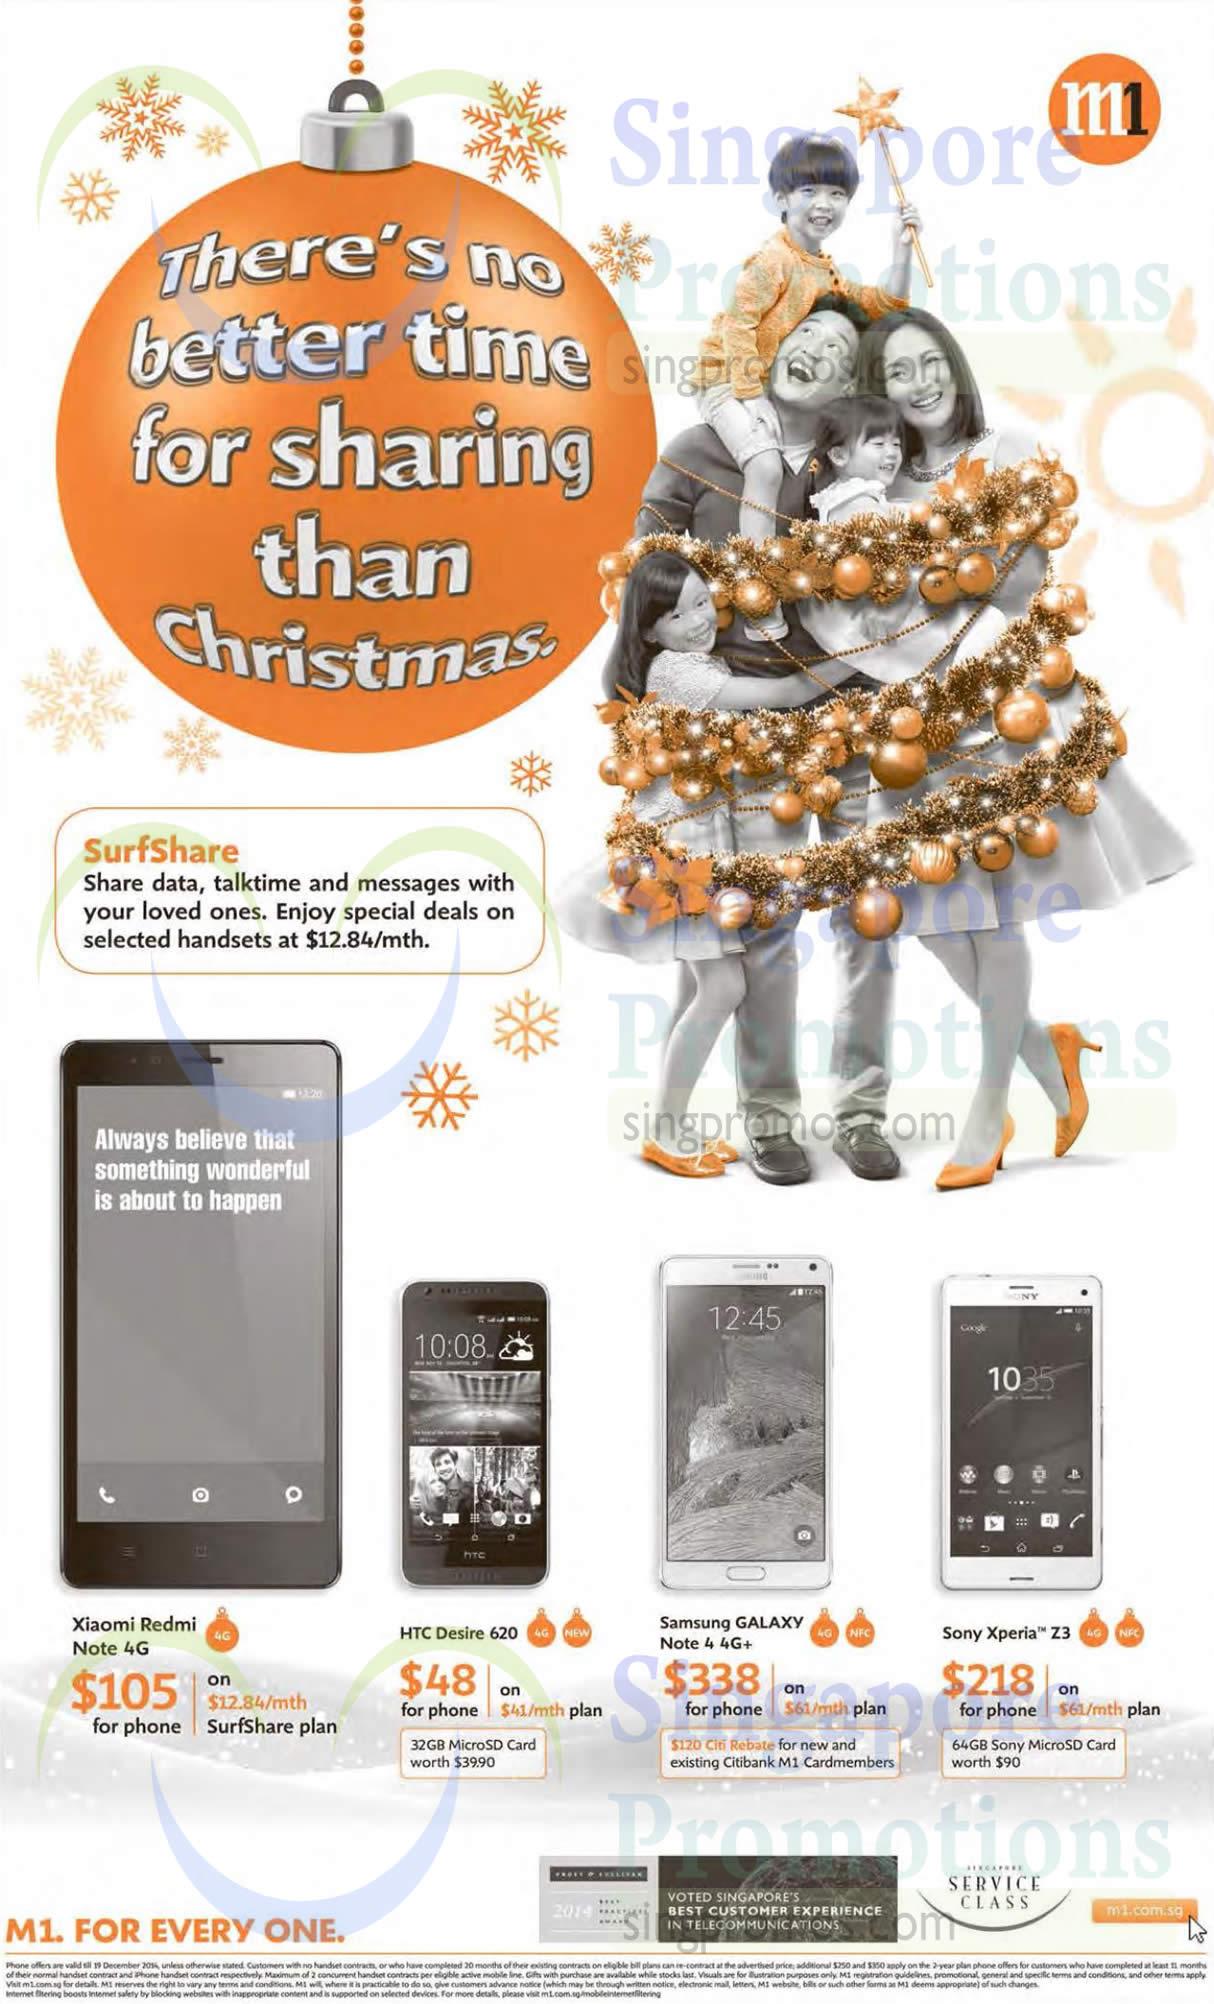 Xiaomi Redmi Note, HTC Desire 620, Samsung Galaxy Note 4, Sony Xperia Z3